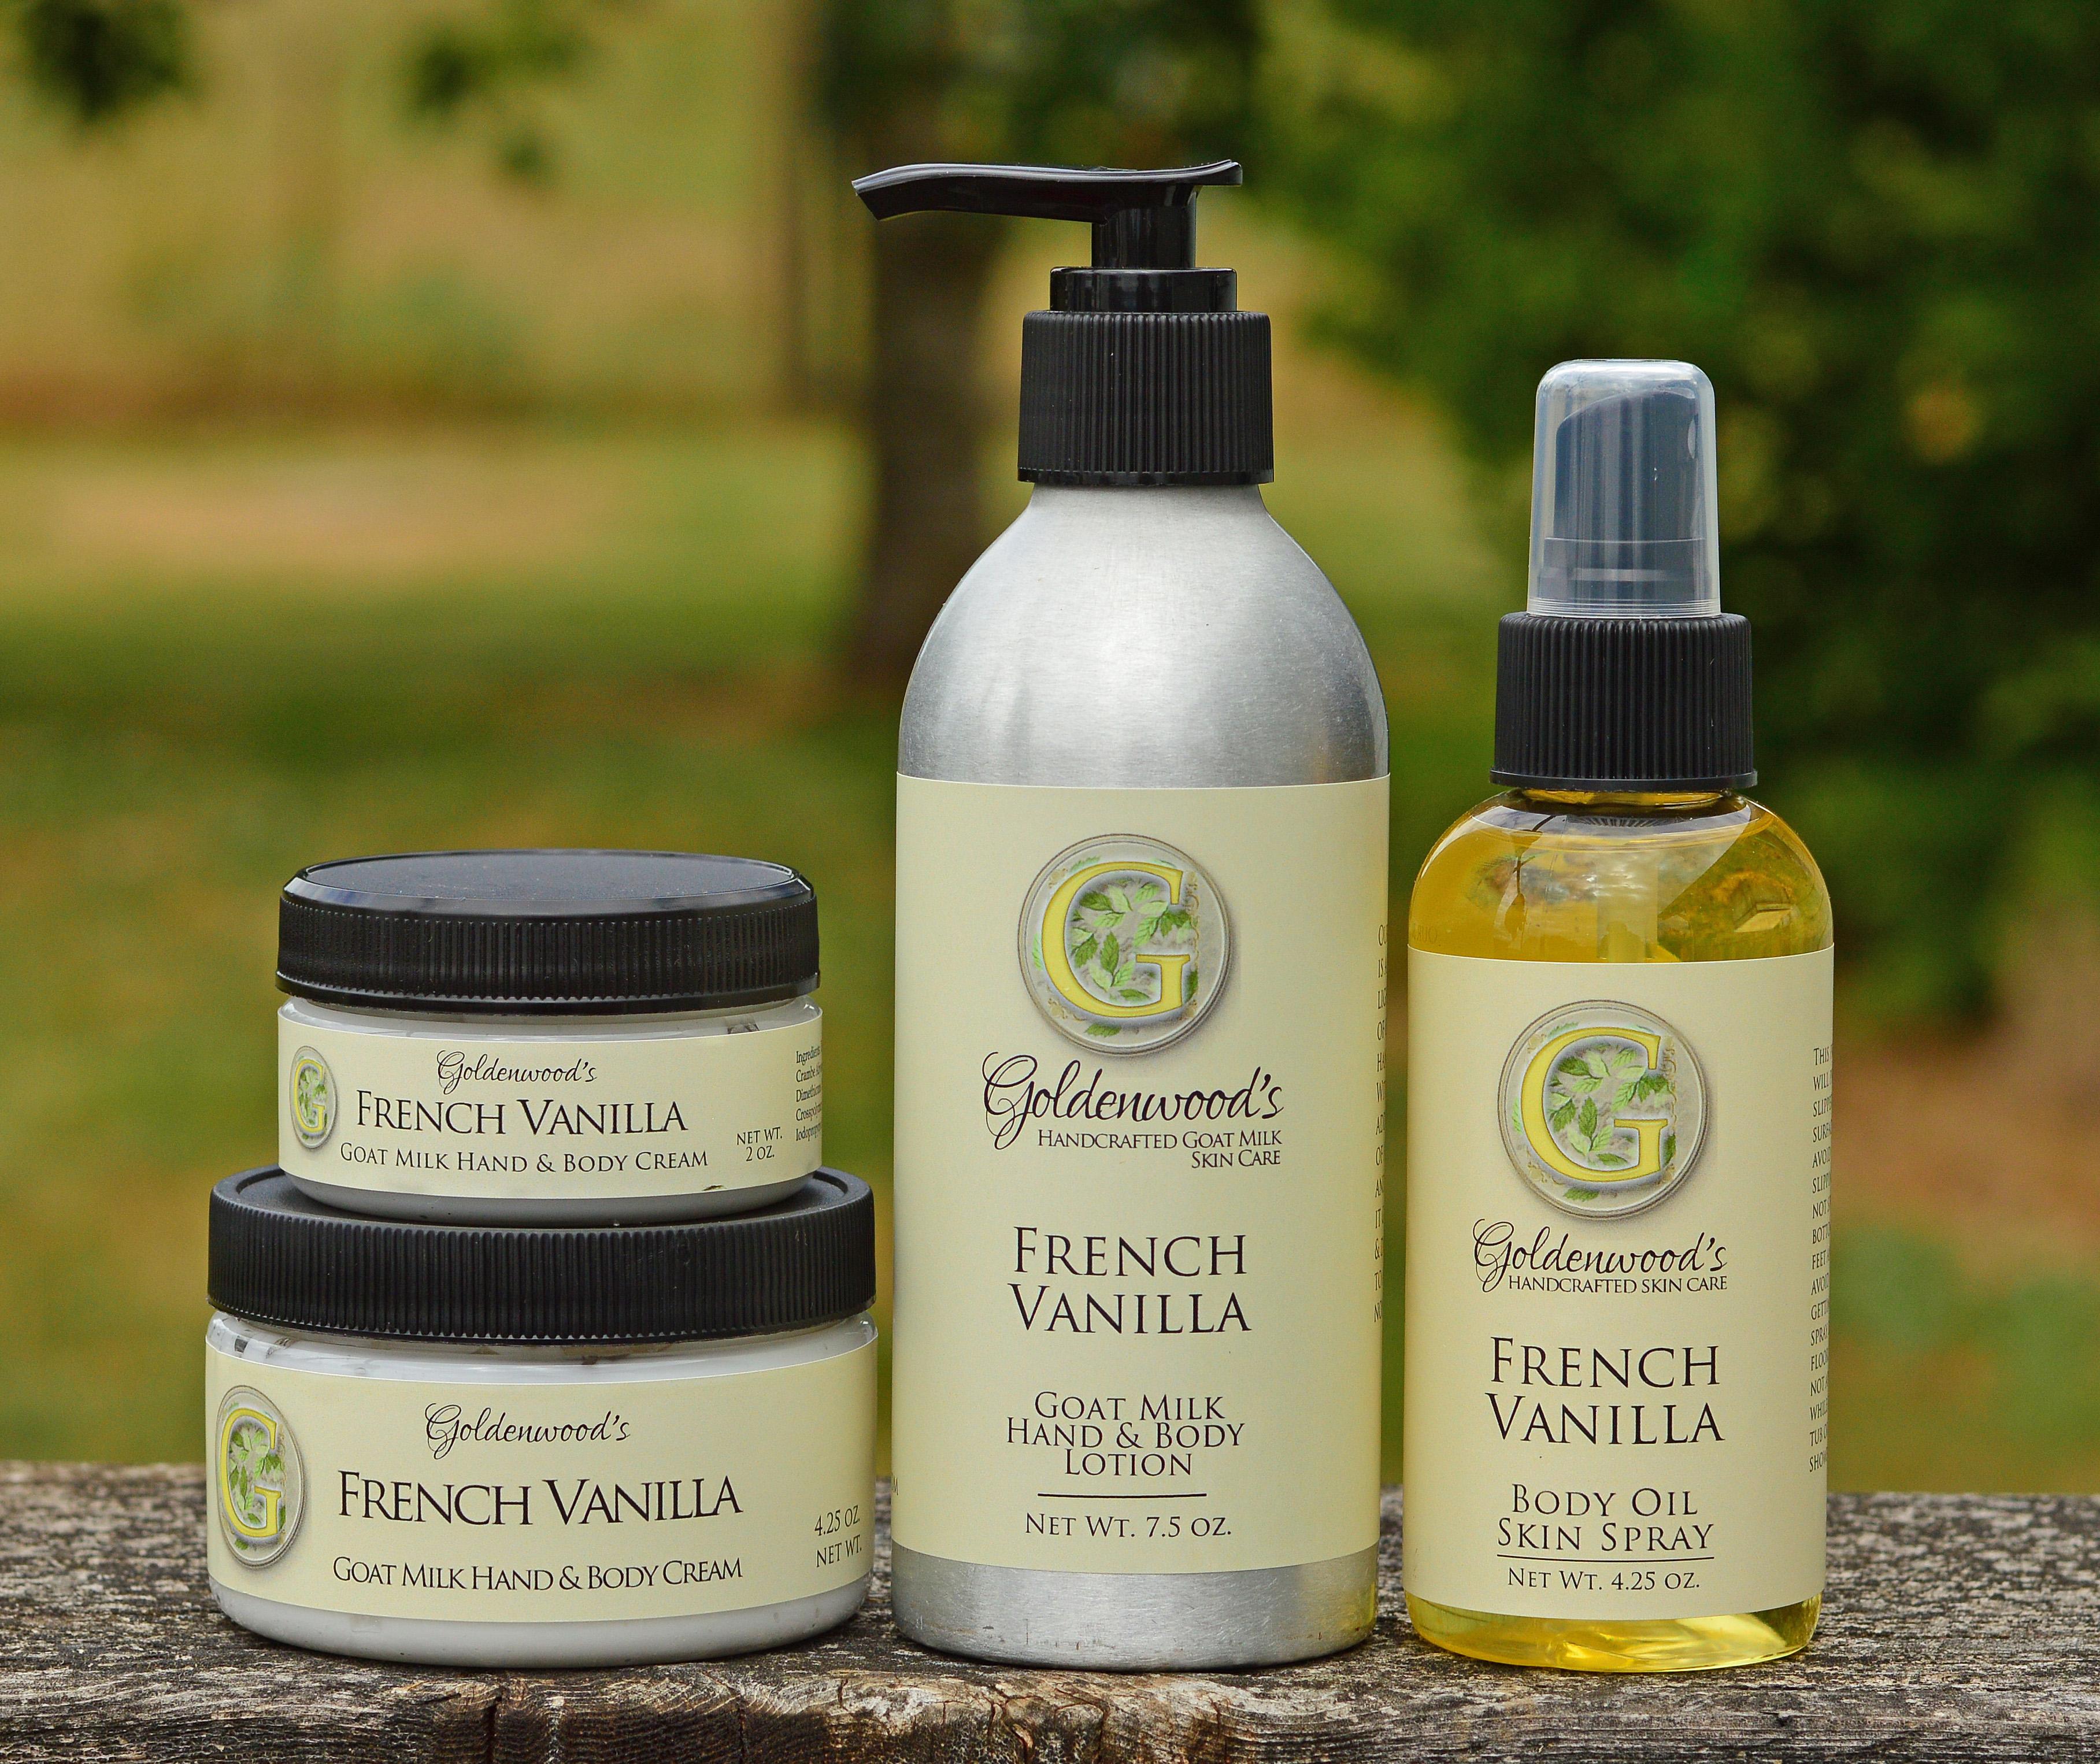 french-vanilla-collection.jpg